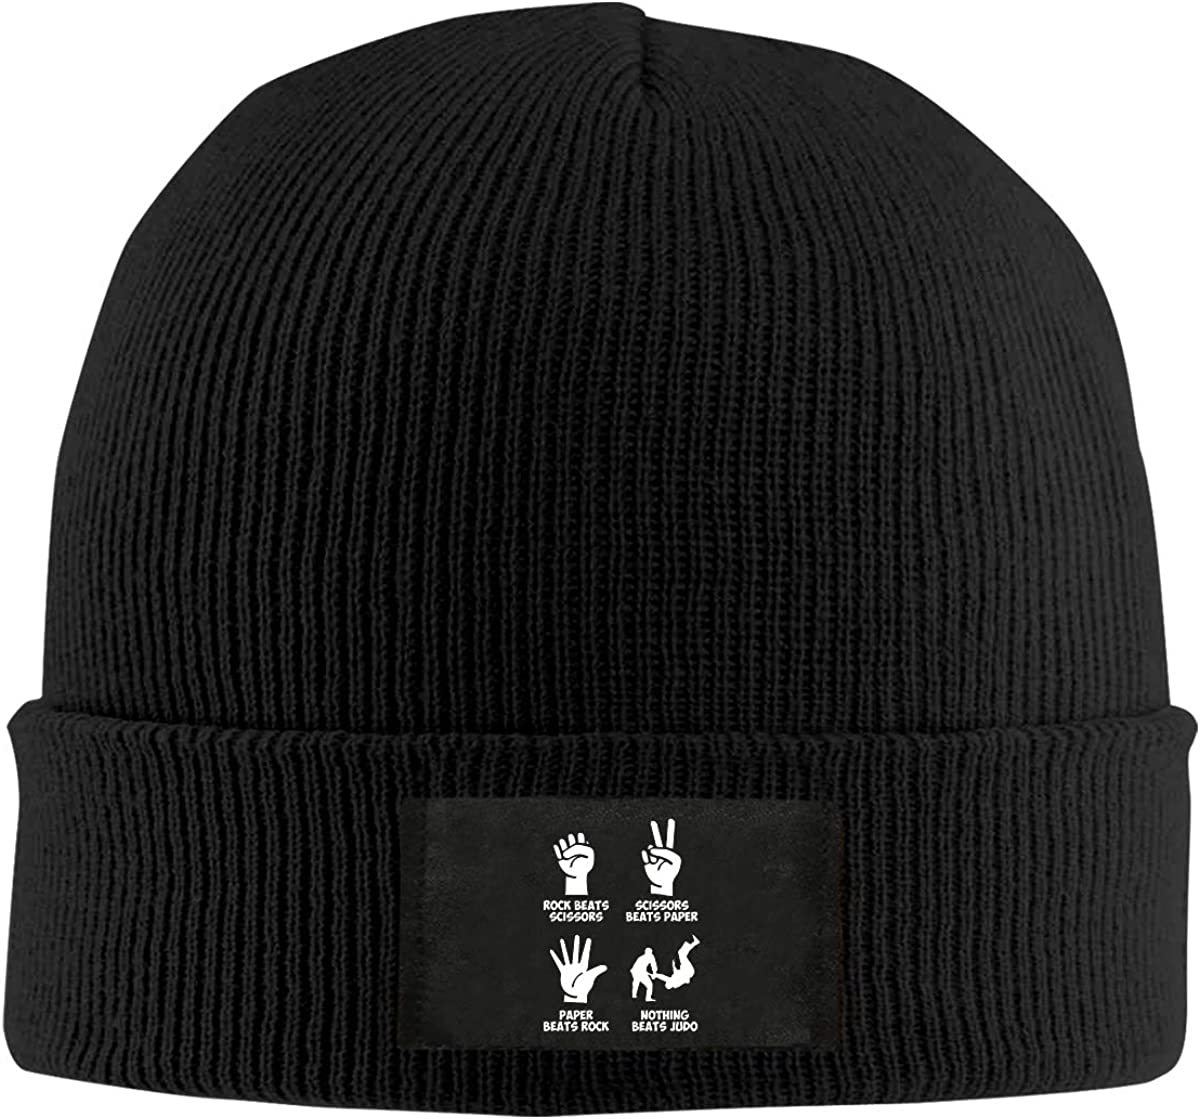 LRHUI Jiu-Jitsu Winter Knitted Hat Warm Wool Skull Beanie Cap